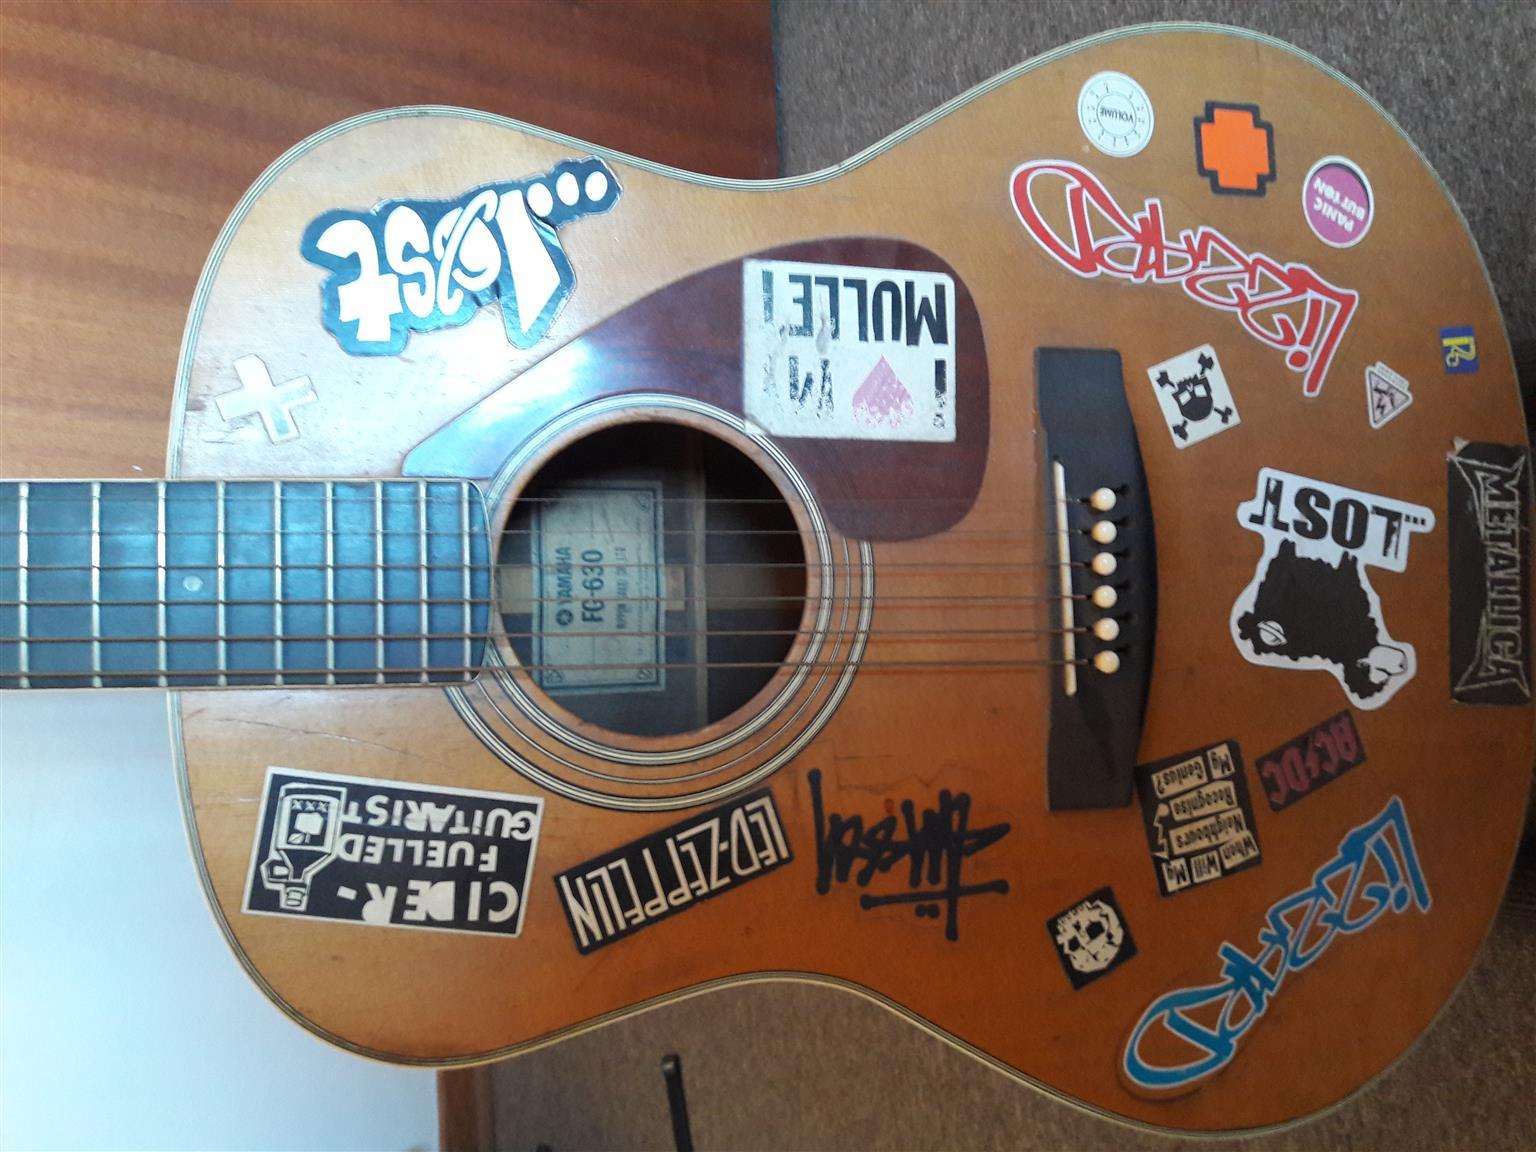 Yamaha FG 630 12 String Vintage Guitar (1970s)